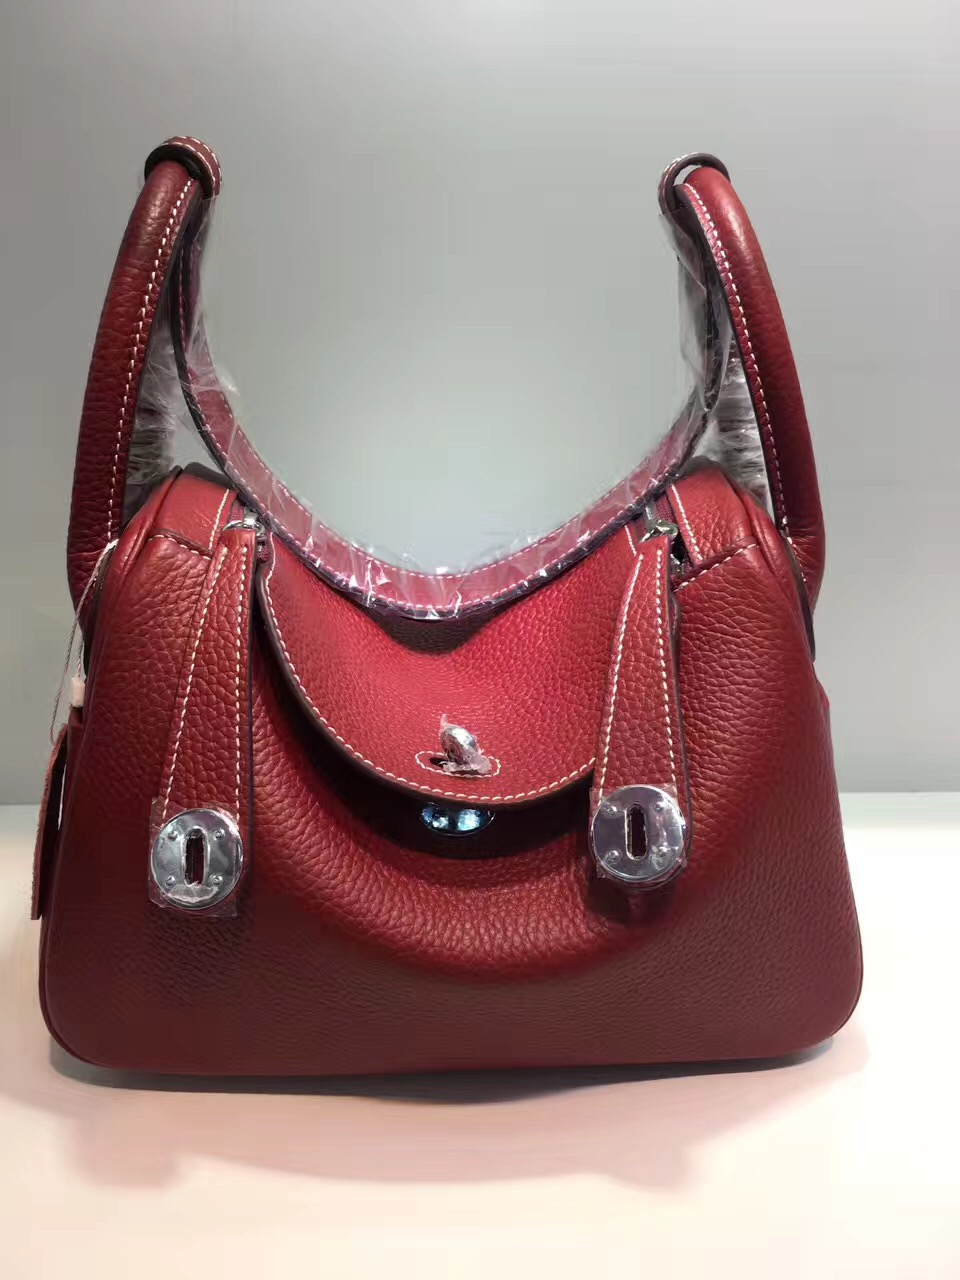 Kafunila luxury brand women handbags famous designer doctor bags 2018 genuine leather vintage shoulder crossbody bags for female